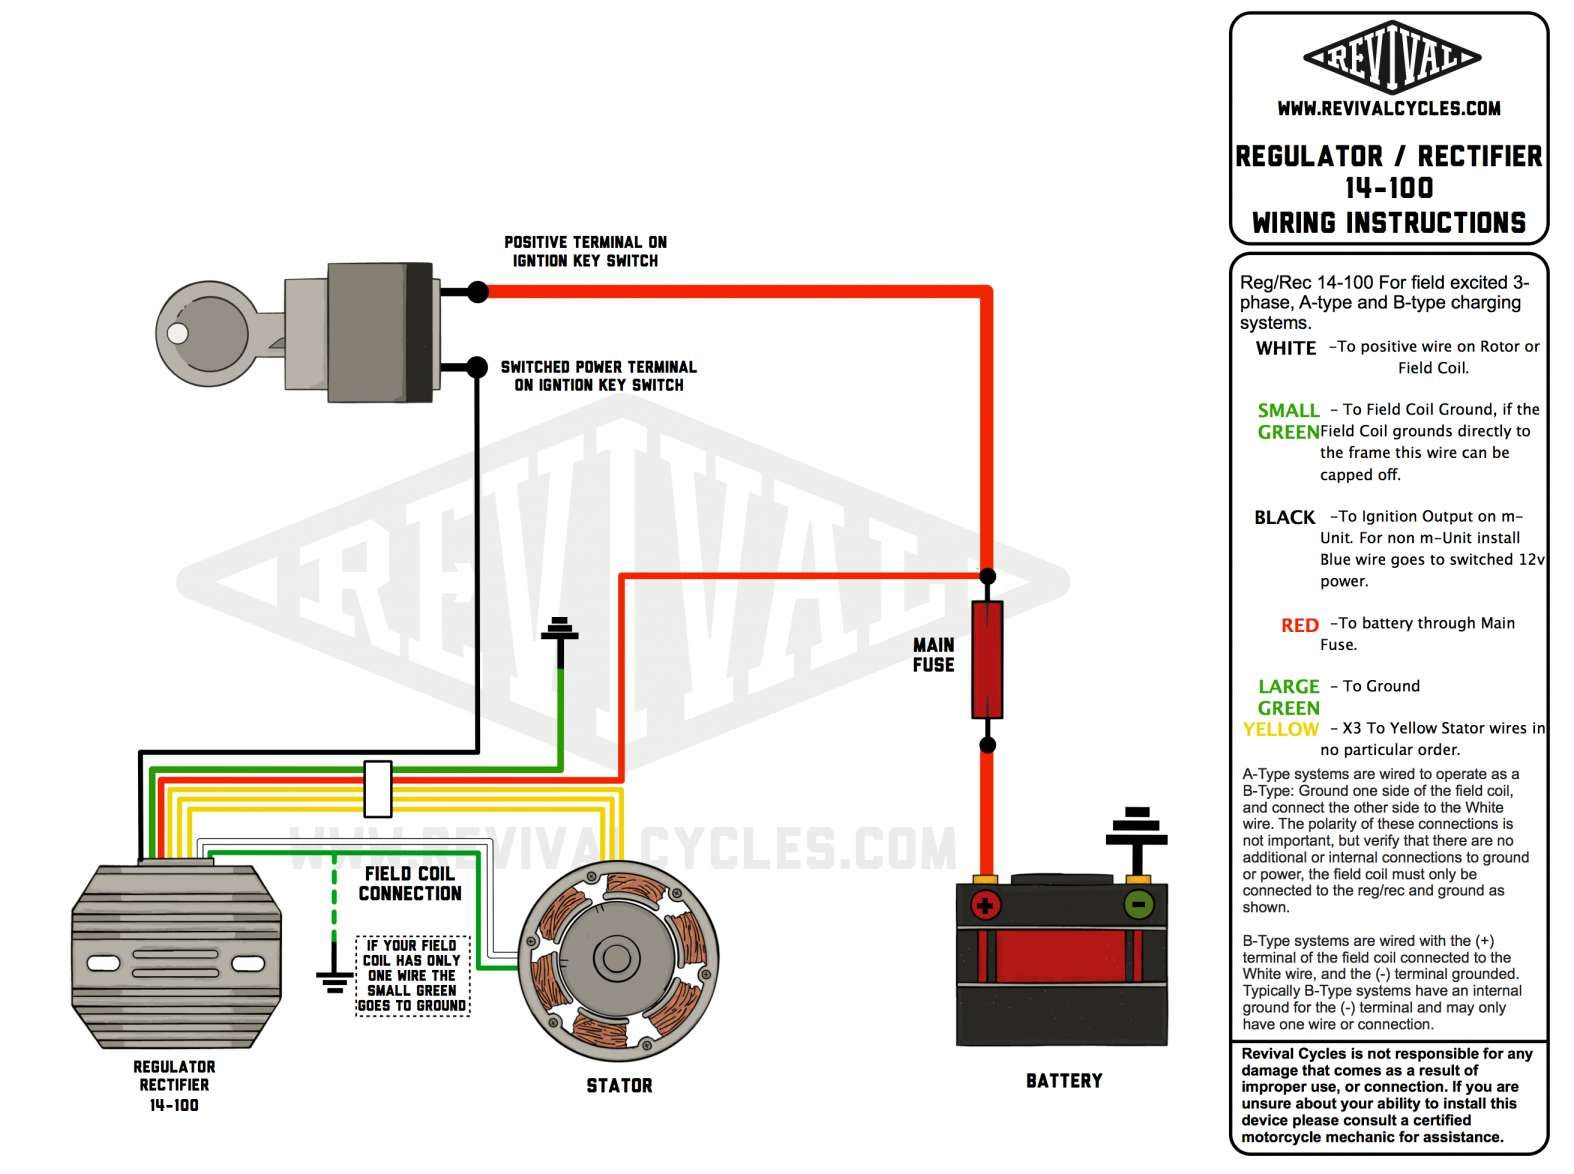 18 Motorcycle Regulator Diagram Motorcycle Diagram Wiringg Net Motorcycle Wiring Voltage Regulator Electrical Wiring Diagram